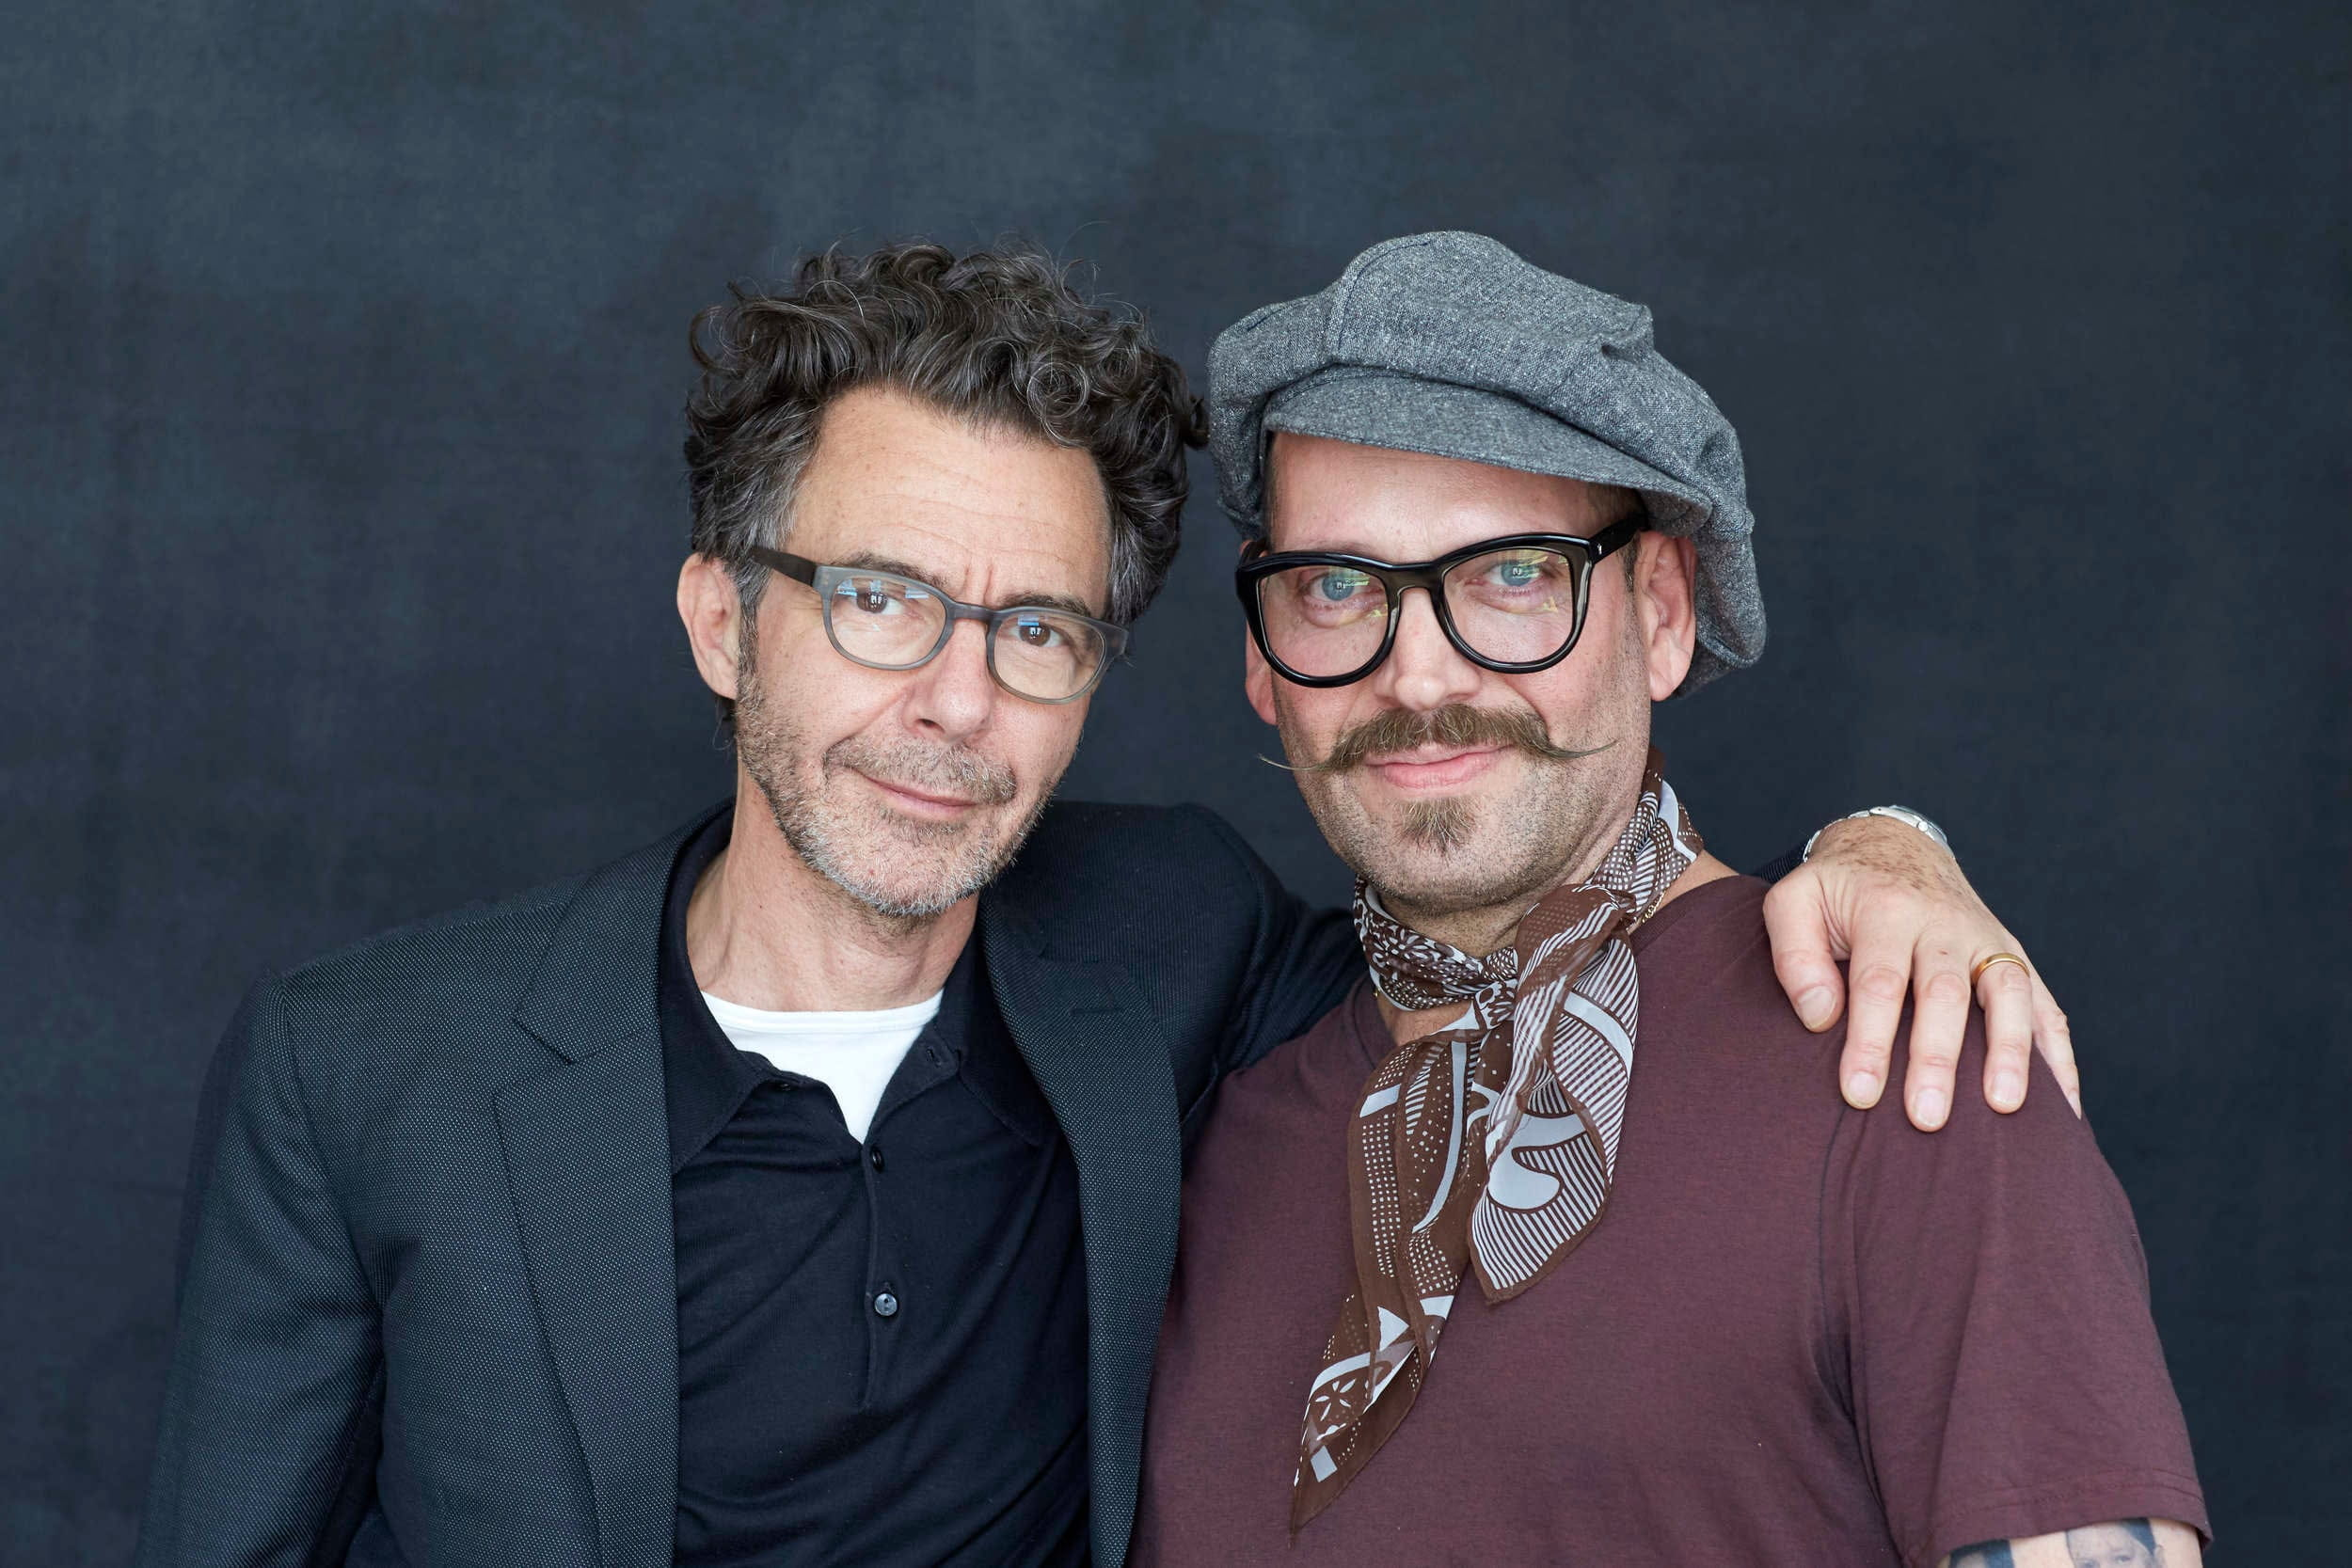 Alberto and Michael Gordon at Hairstory Studio